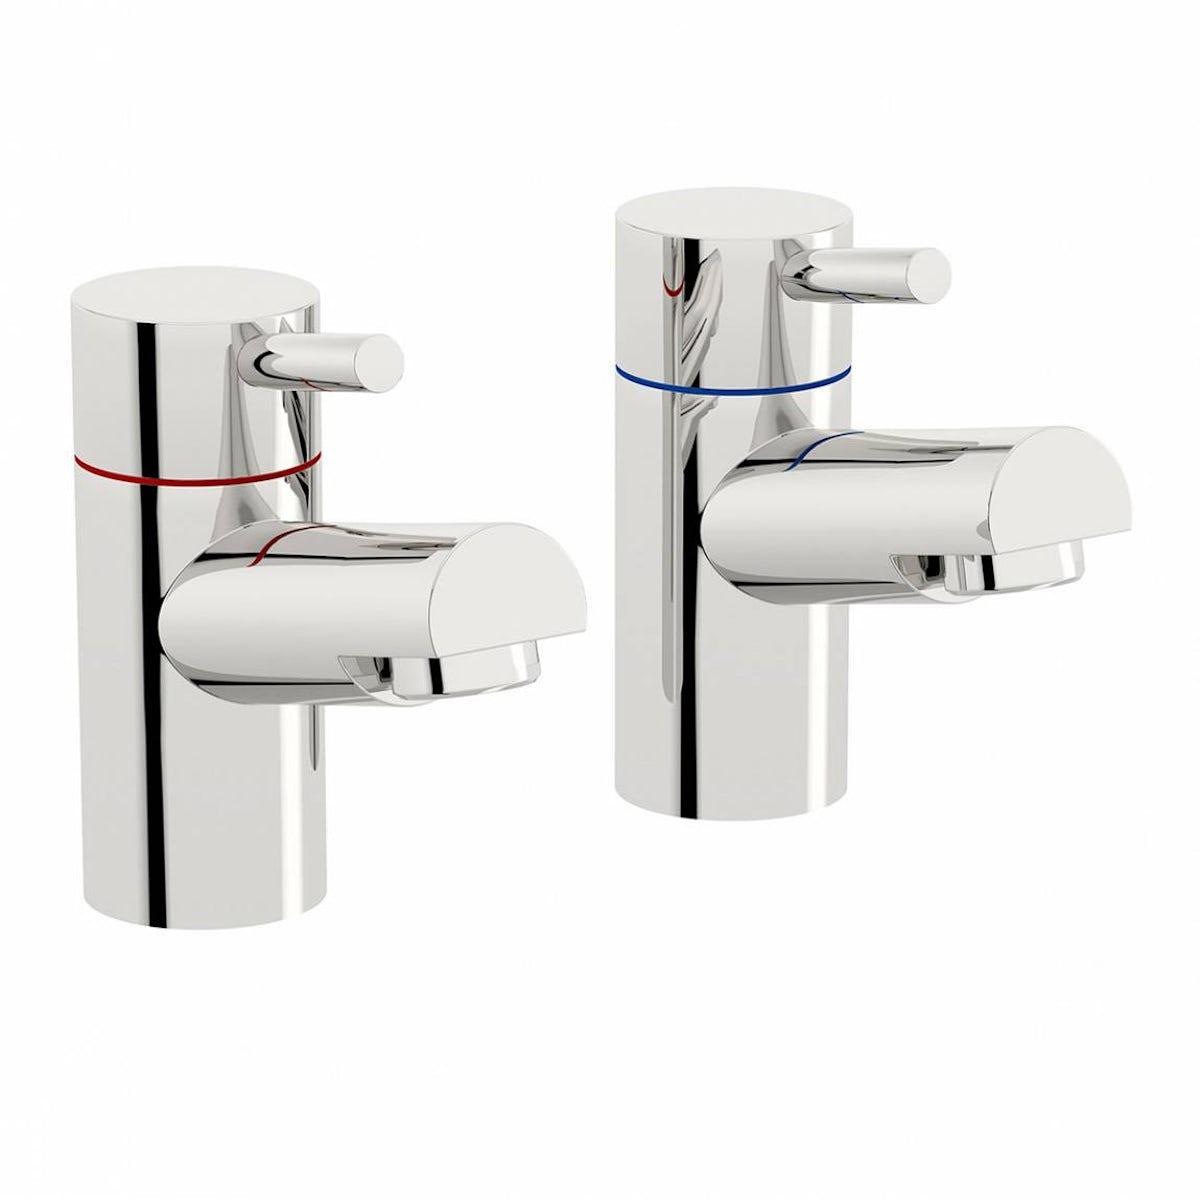 orchard matrix basin tap and bath shower mixer tap pack matrix basin tap and bath shower mixer pack